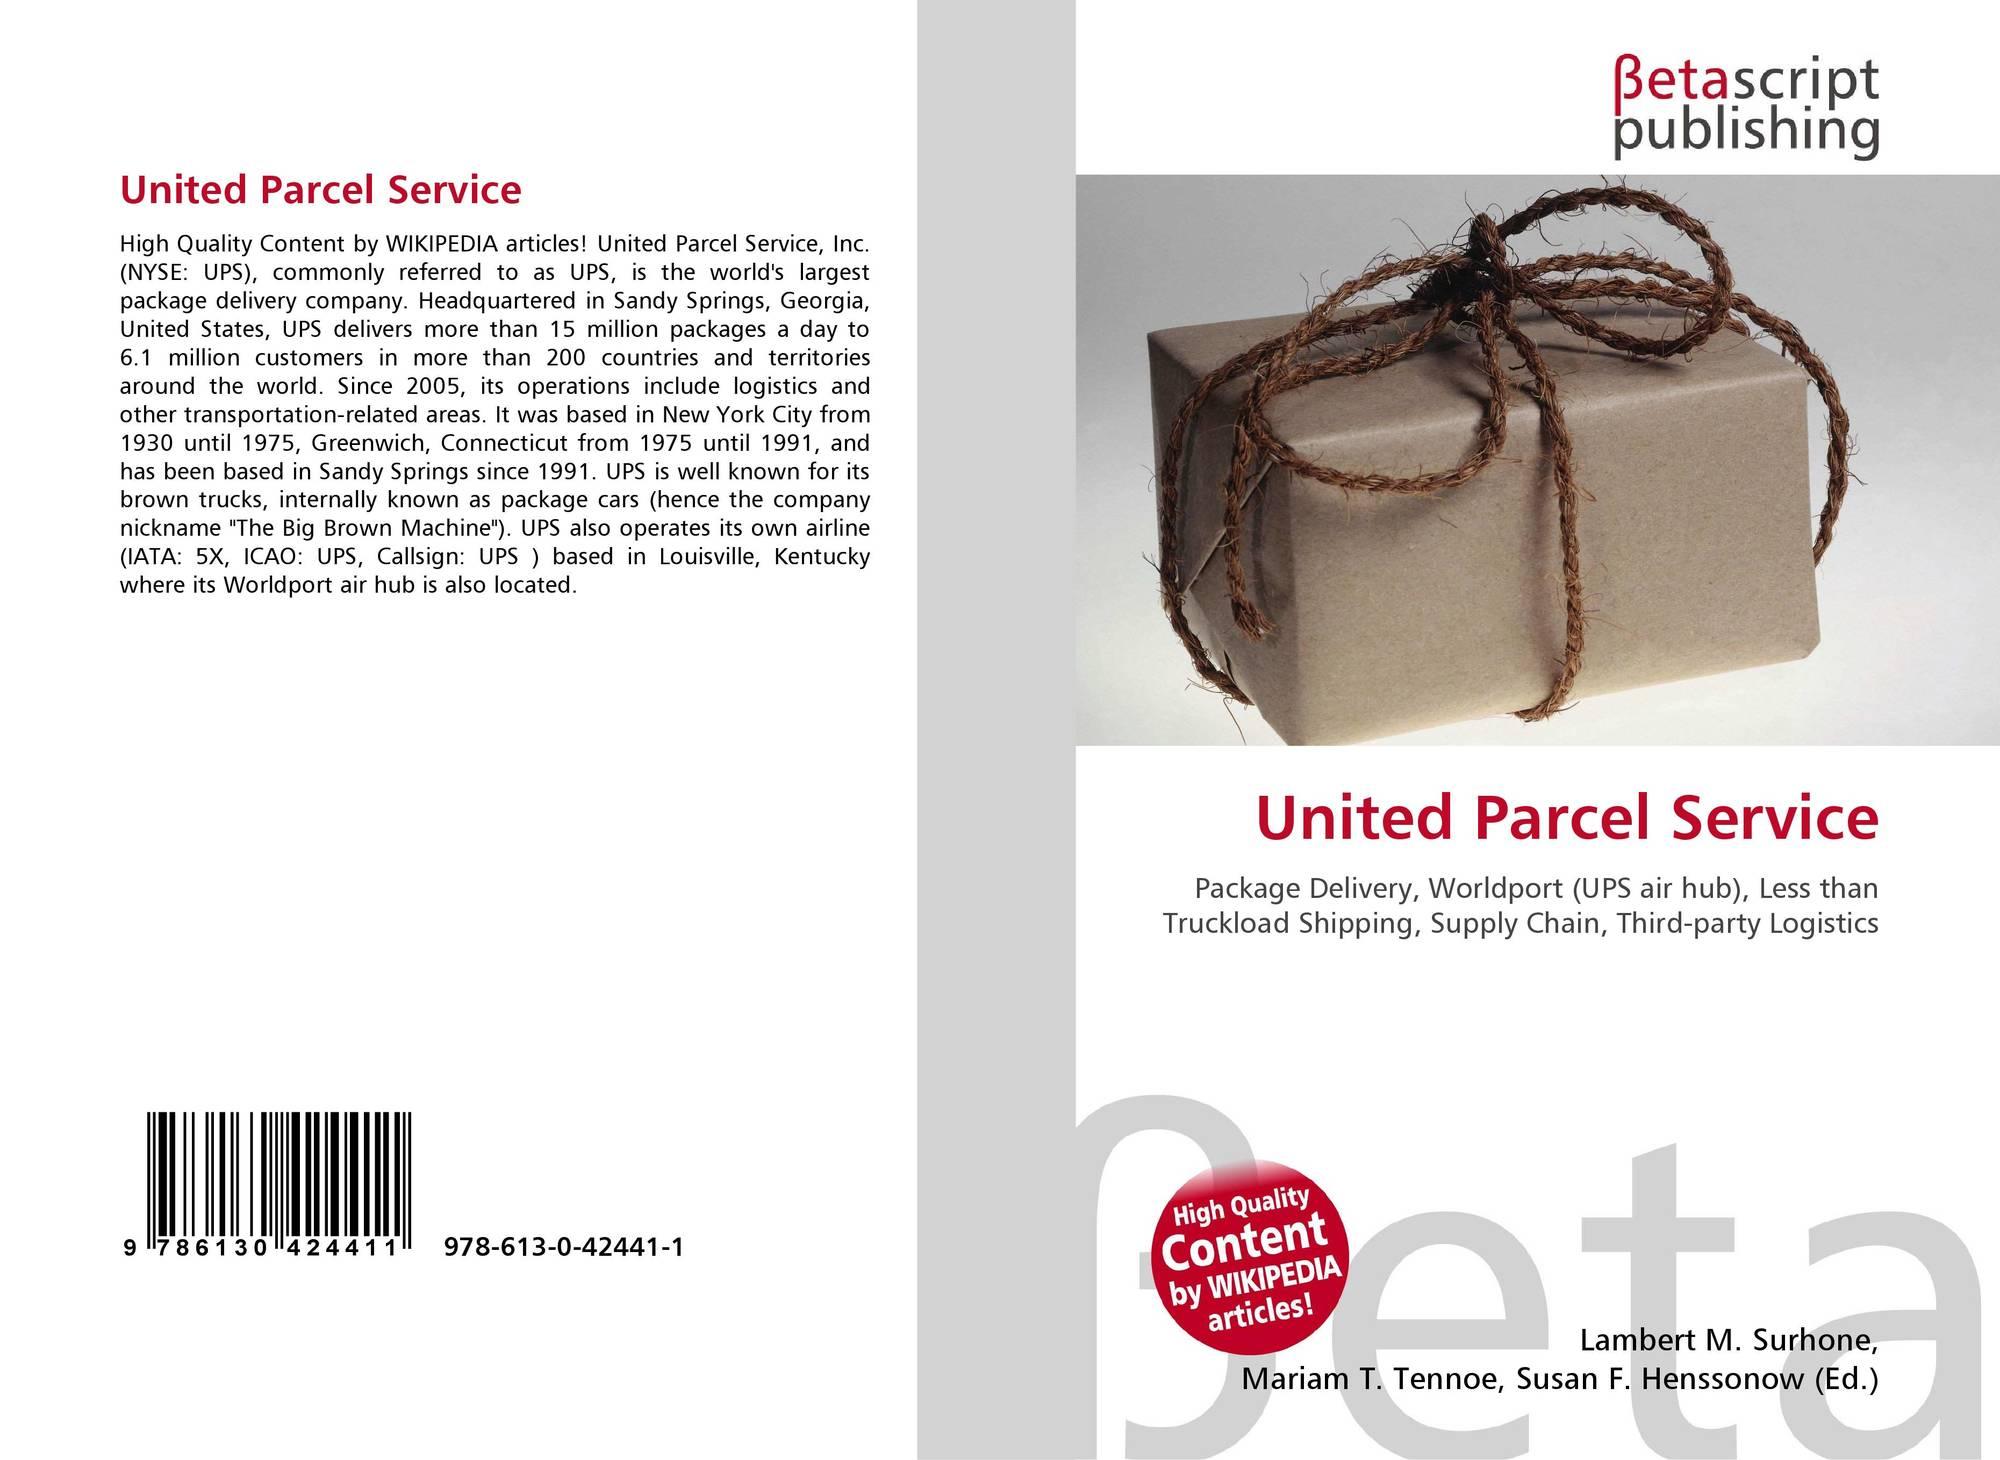 United parcel service near me